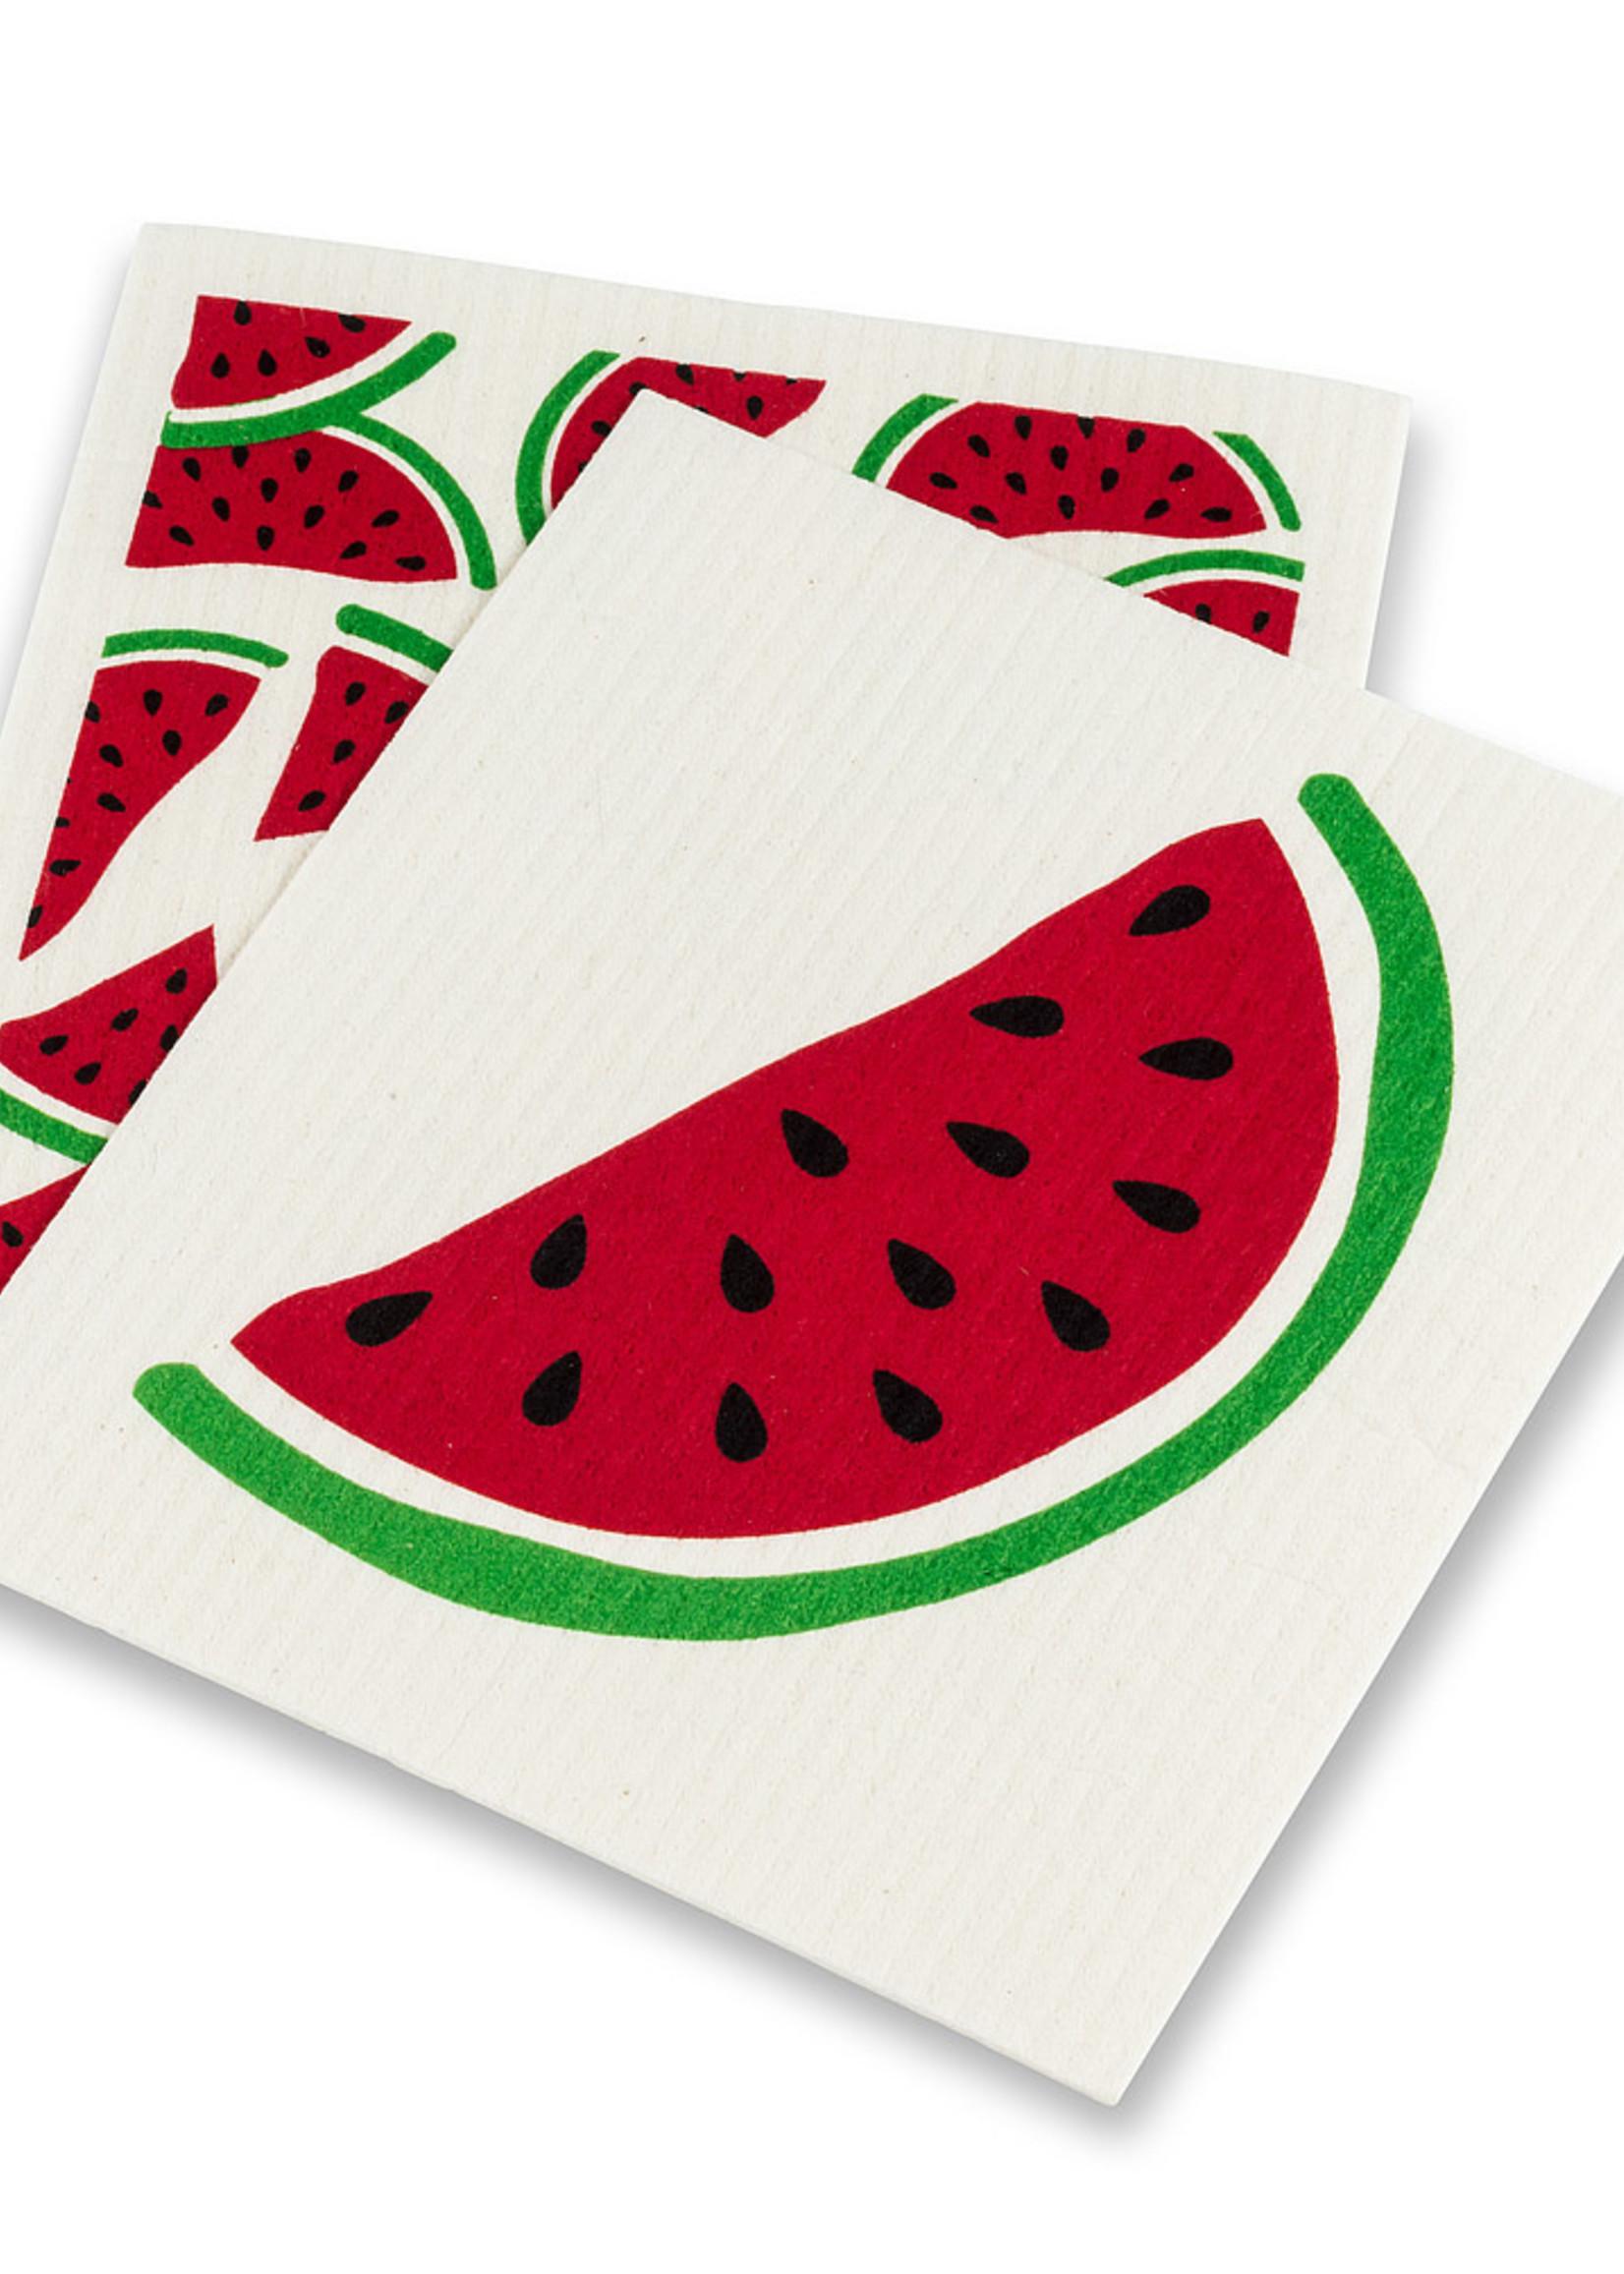 Abbott S/2 Watermelon Swedish Dishcloths